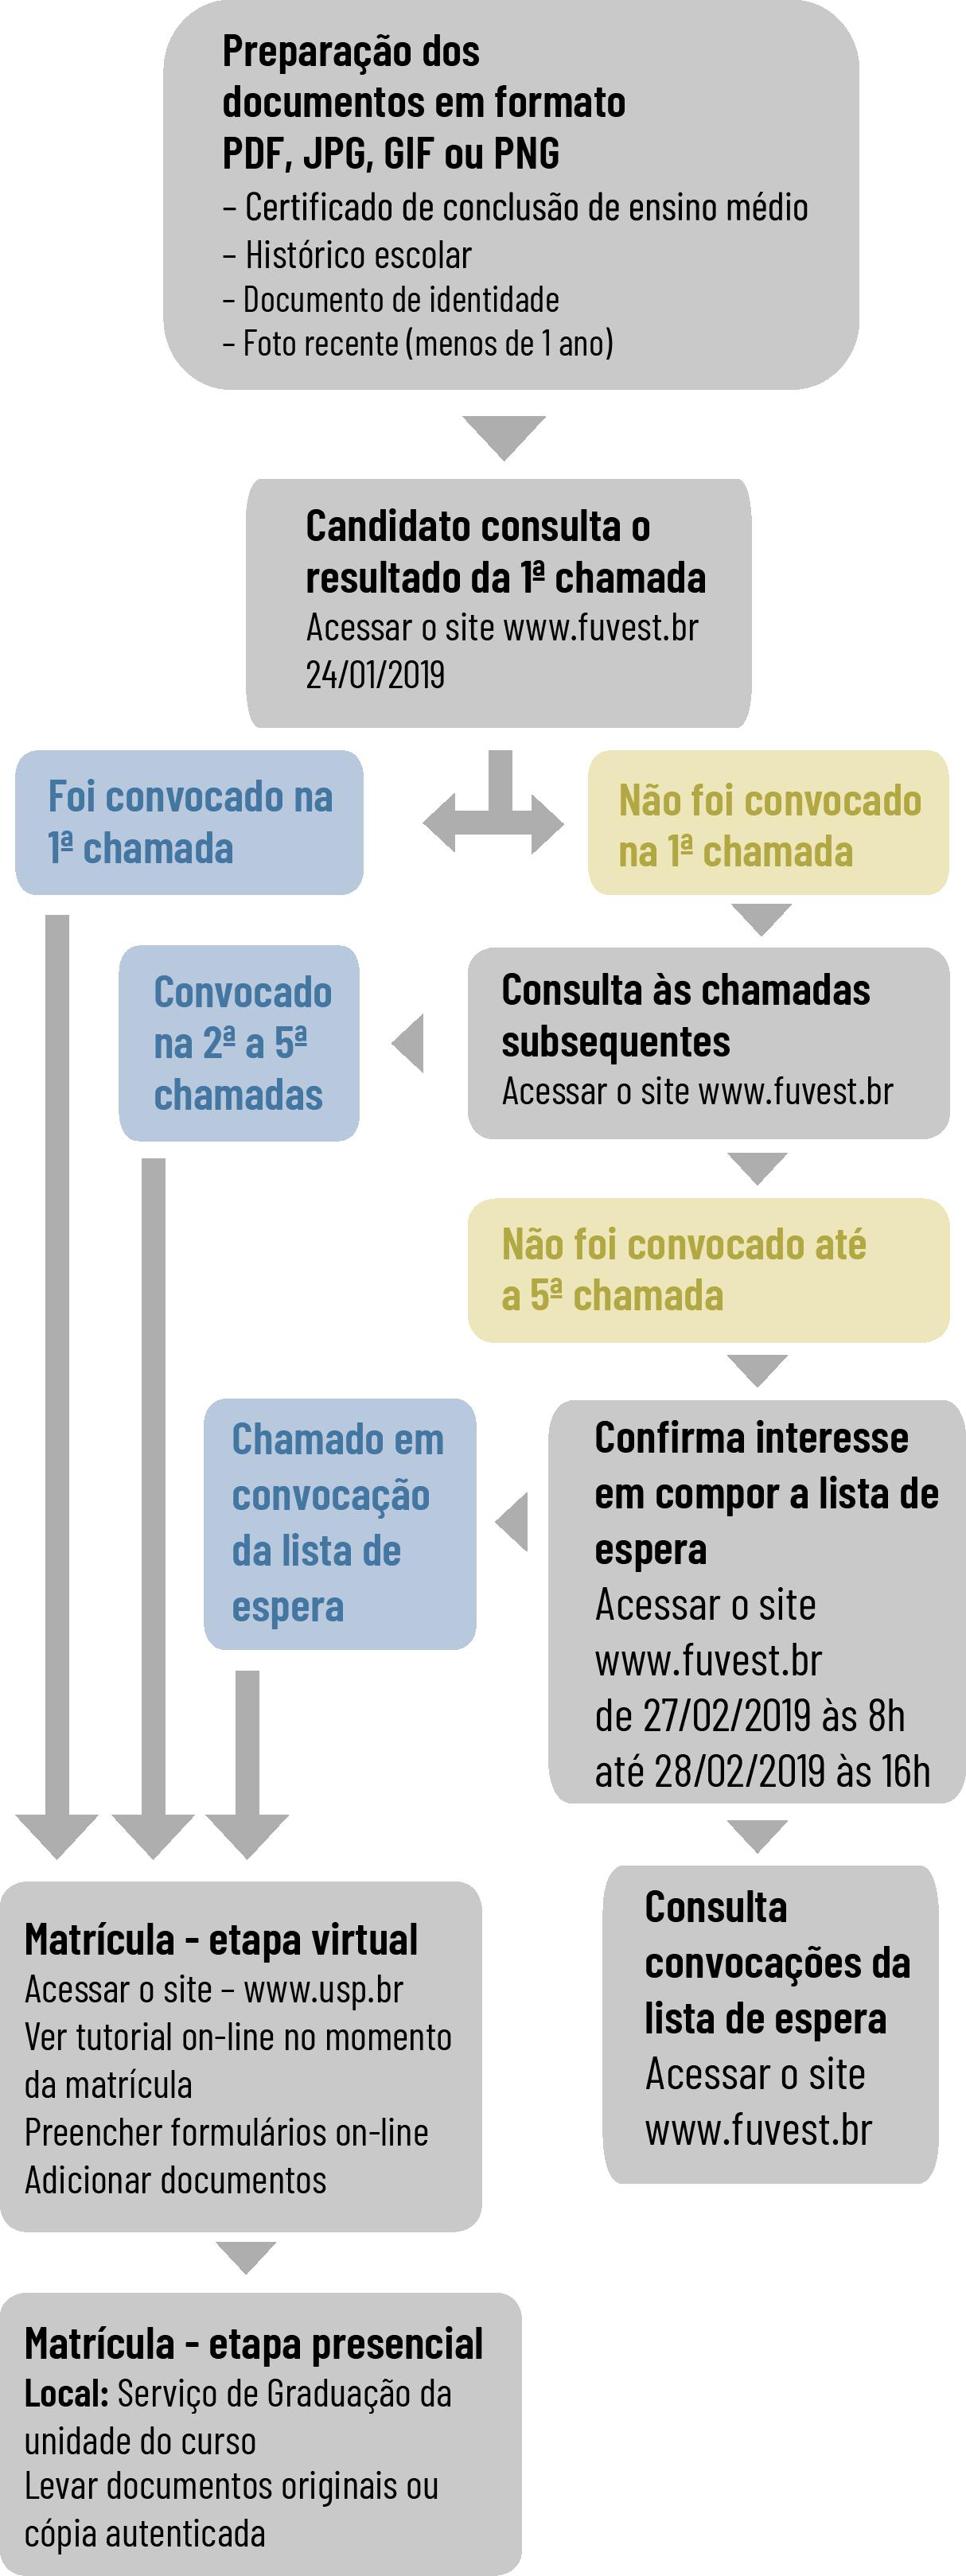 Http//www.fuvest.br/vest 2014//relacao Candidato Vaga 2014.pdf